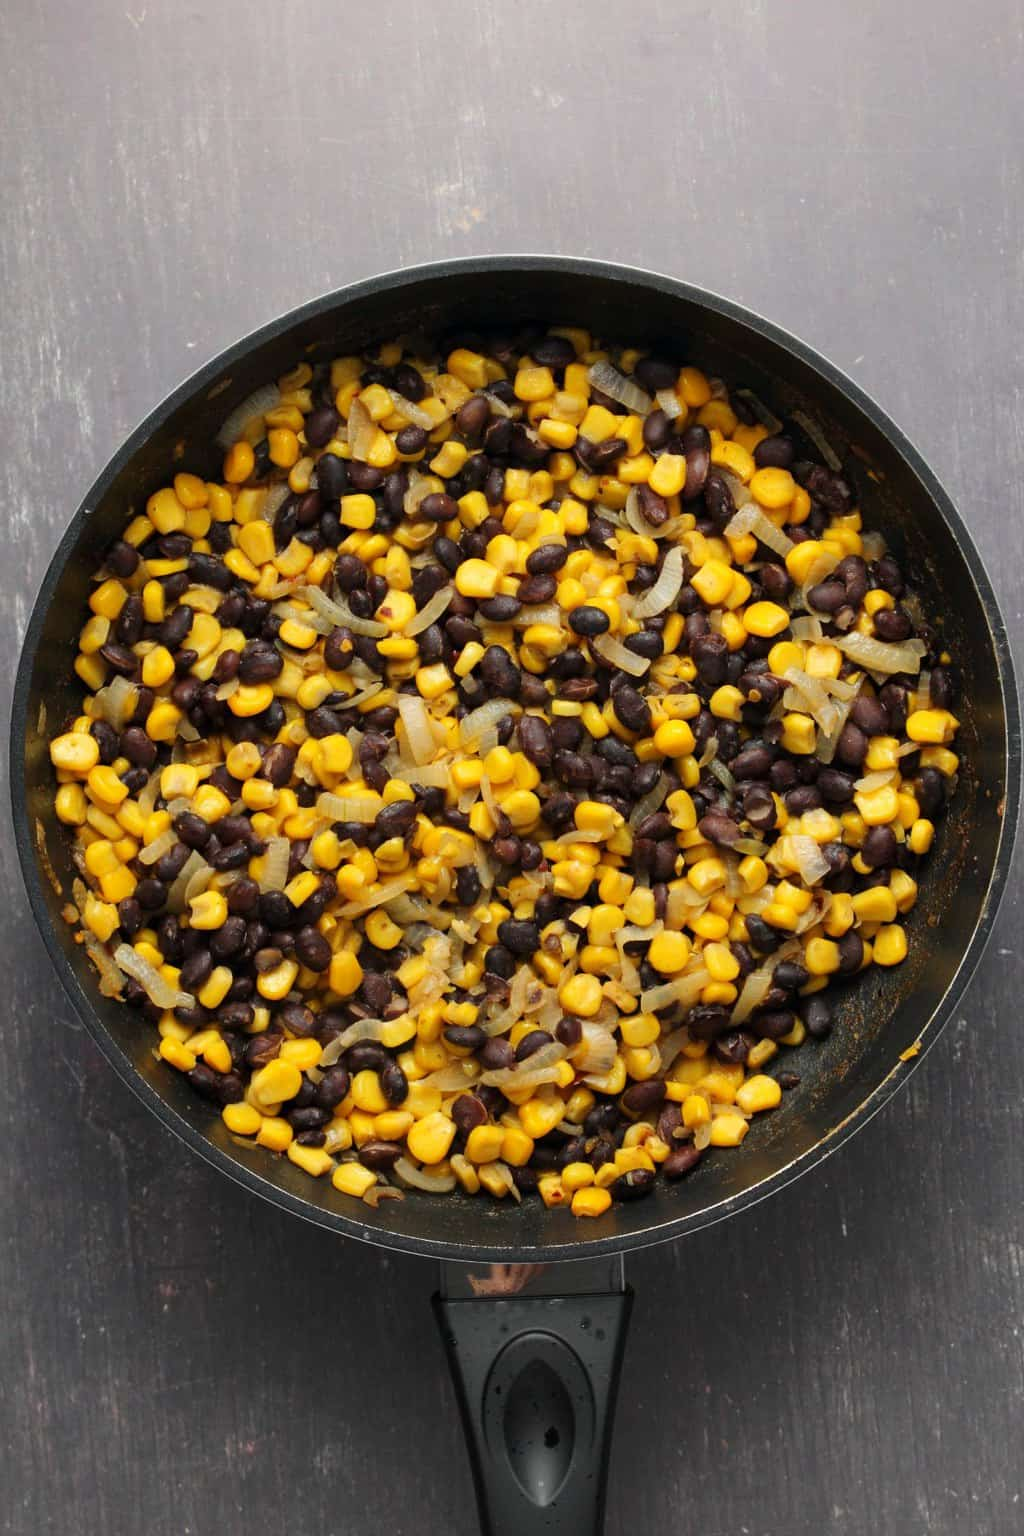 Black bean and corn mix for vegan burritos in a frying pan.